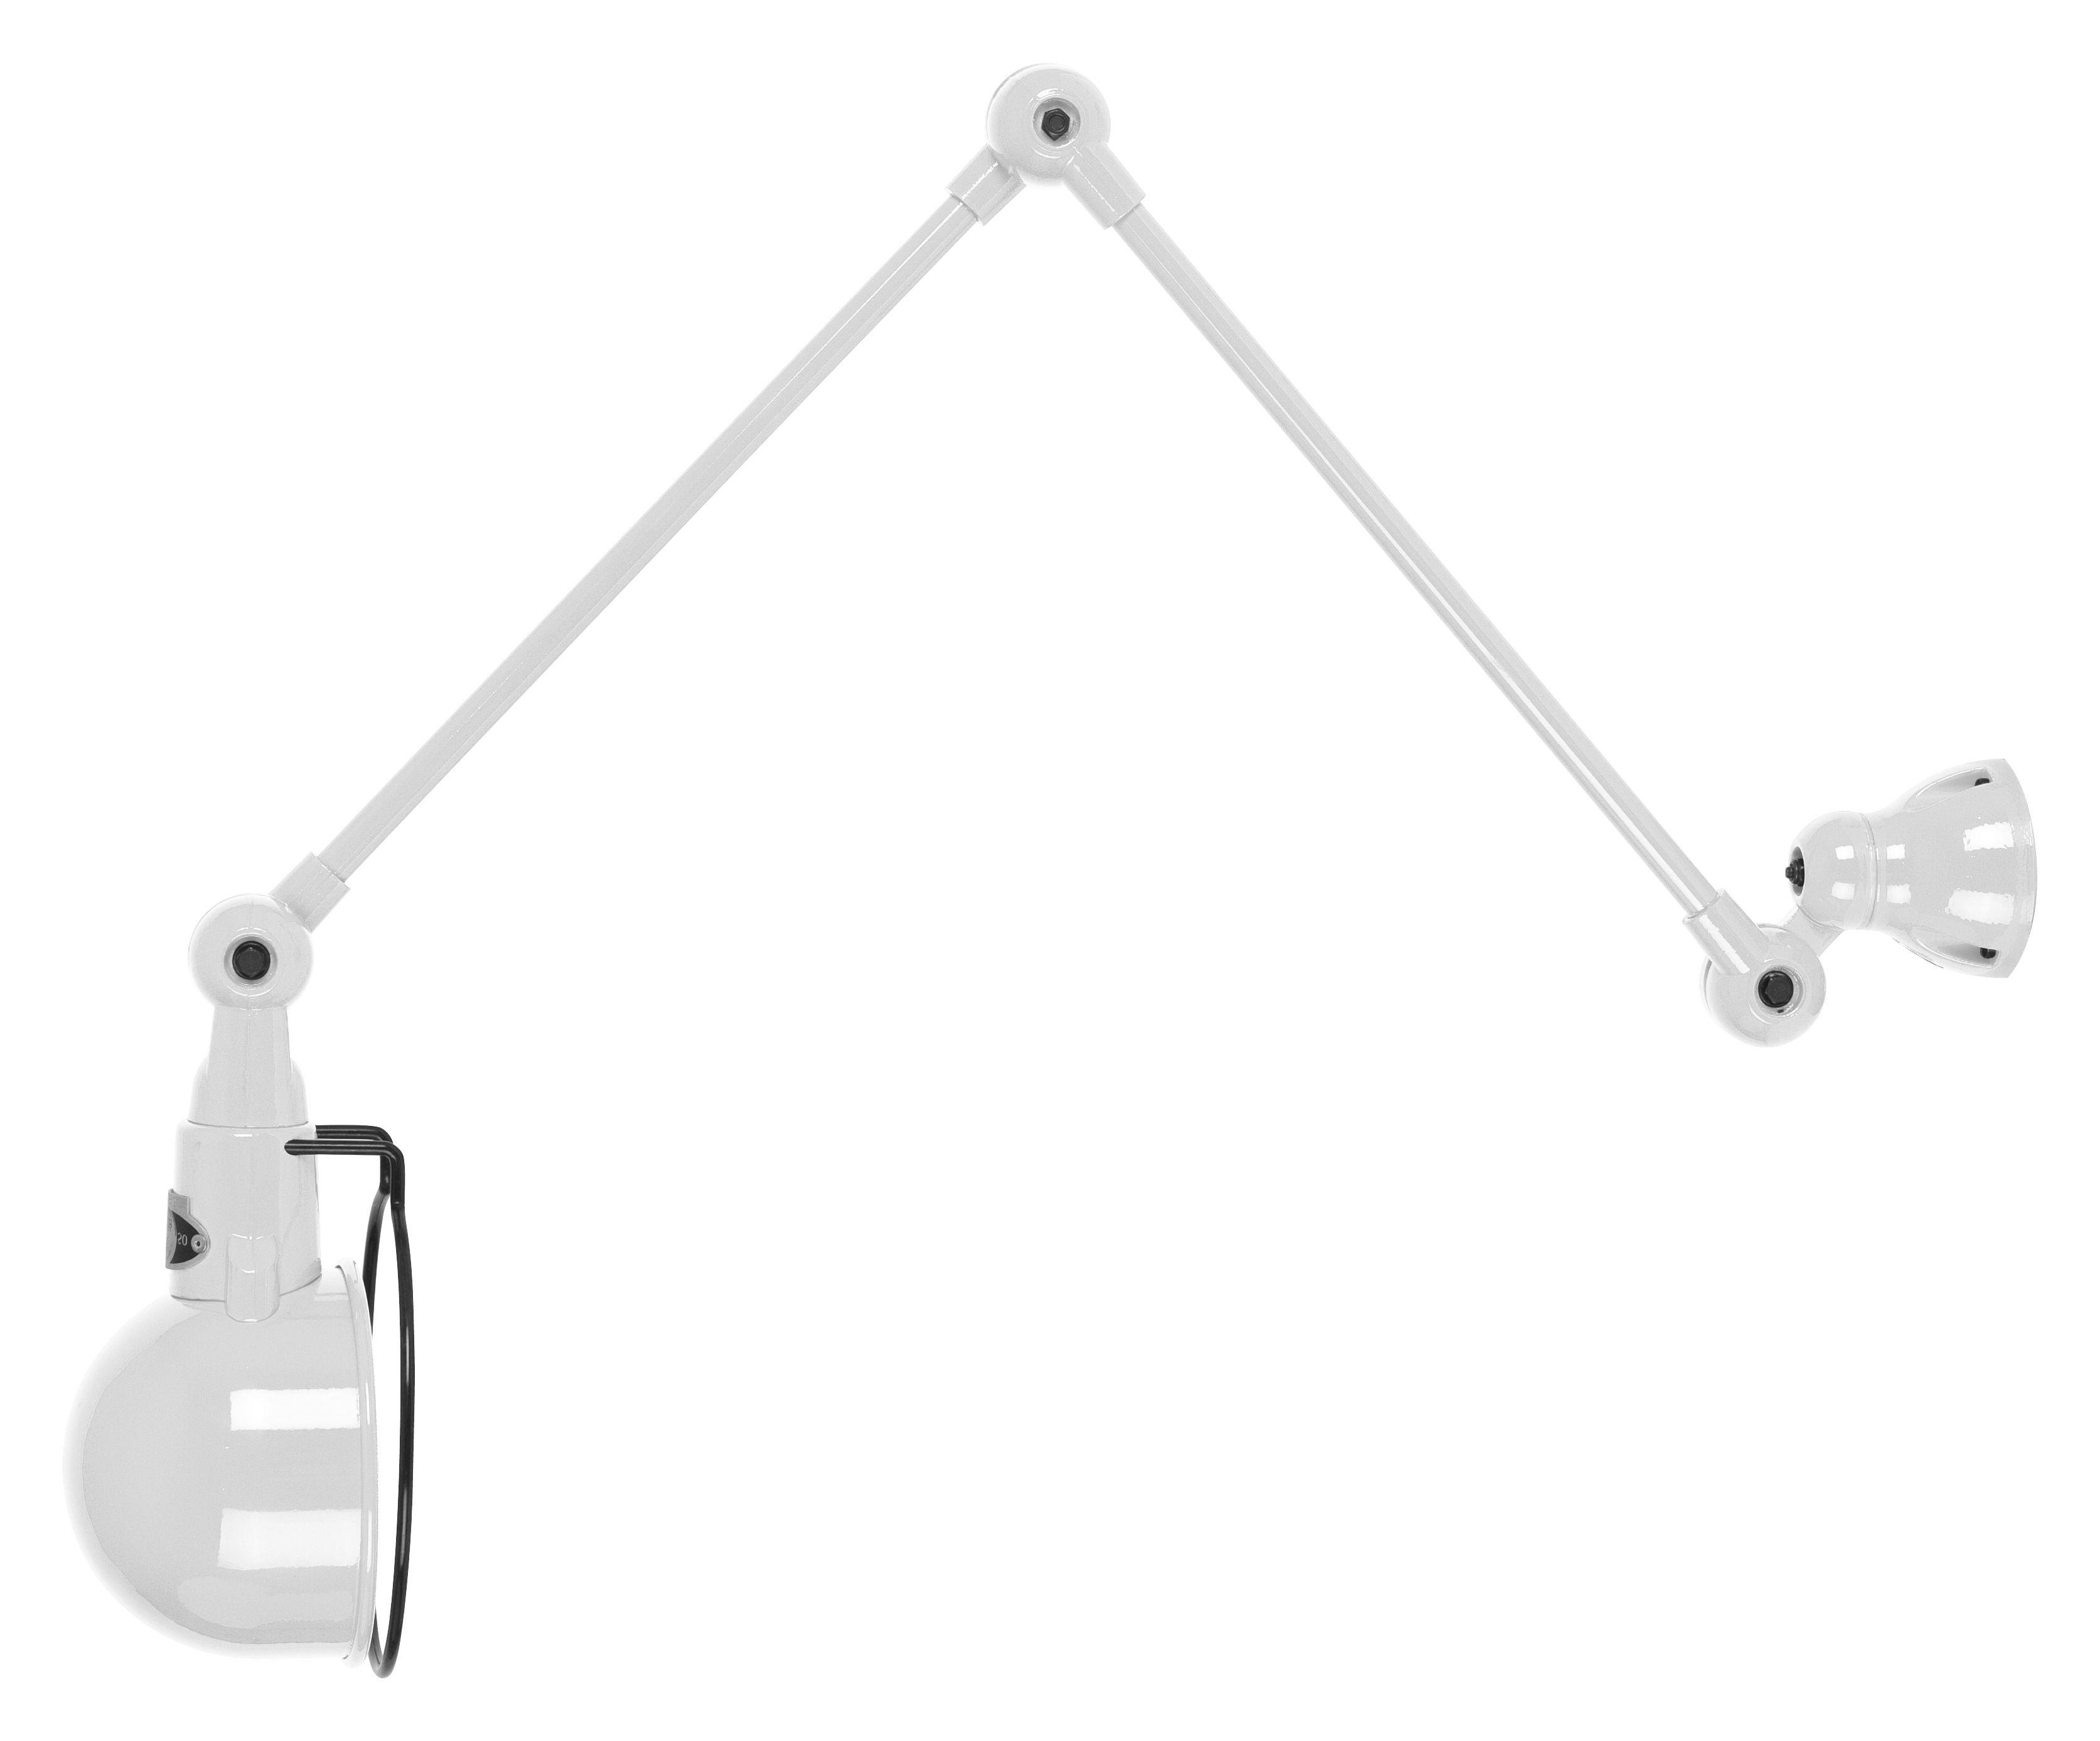 applique signal 2 bras l max 60 cm blanc brillant jield. Black Bedroom Furniture Sets. Home Design Ideas